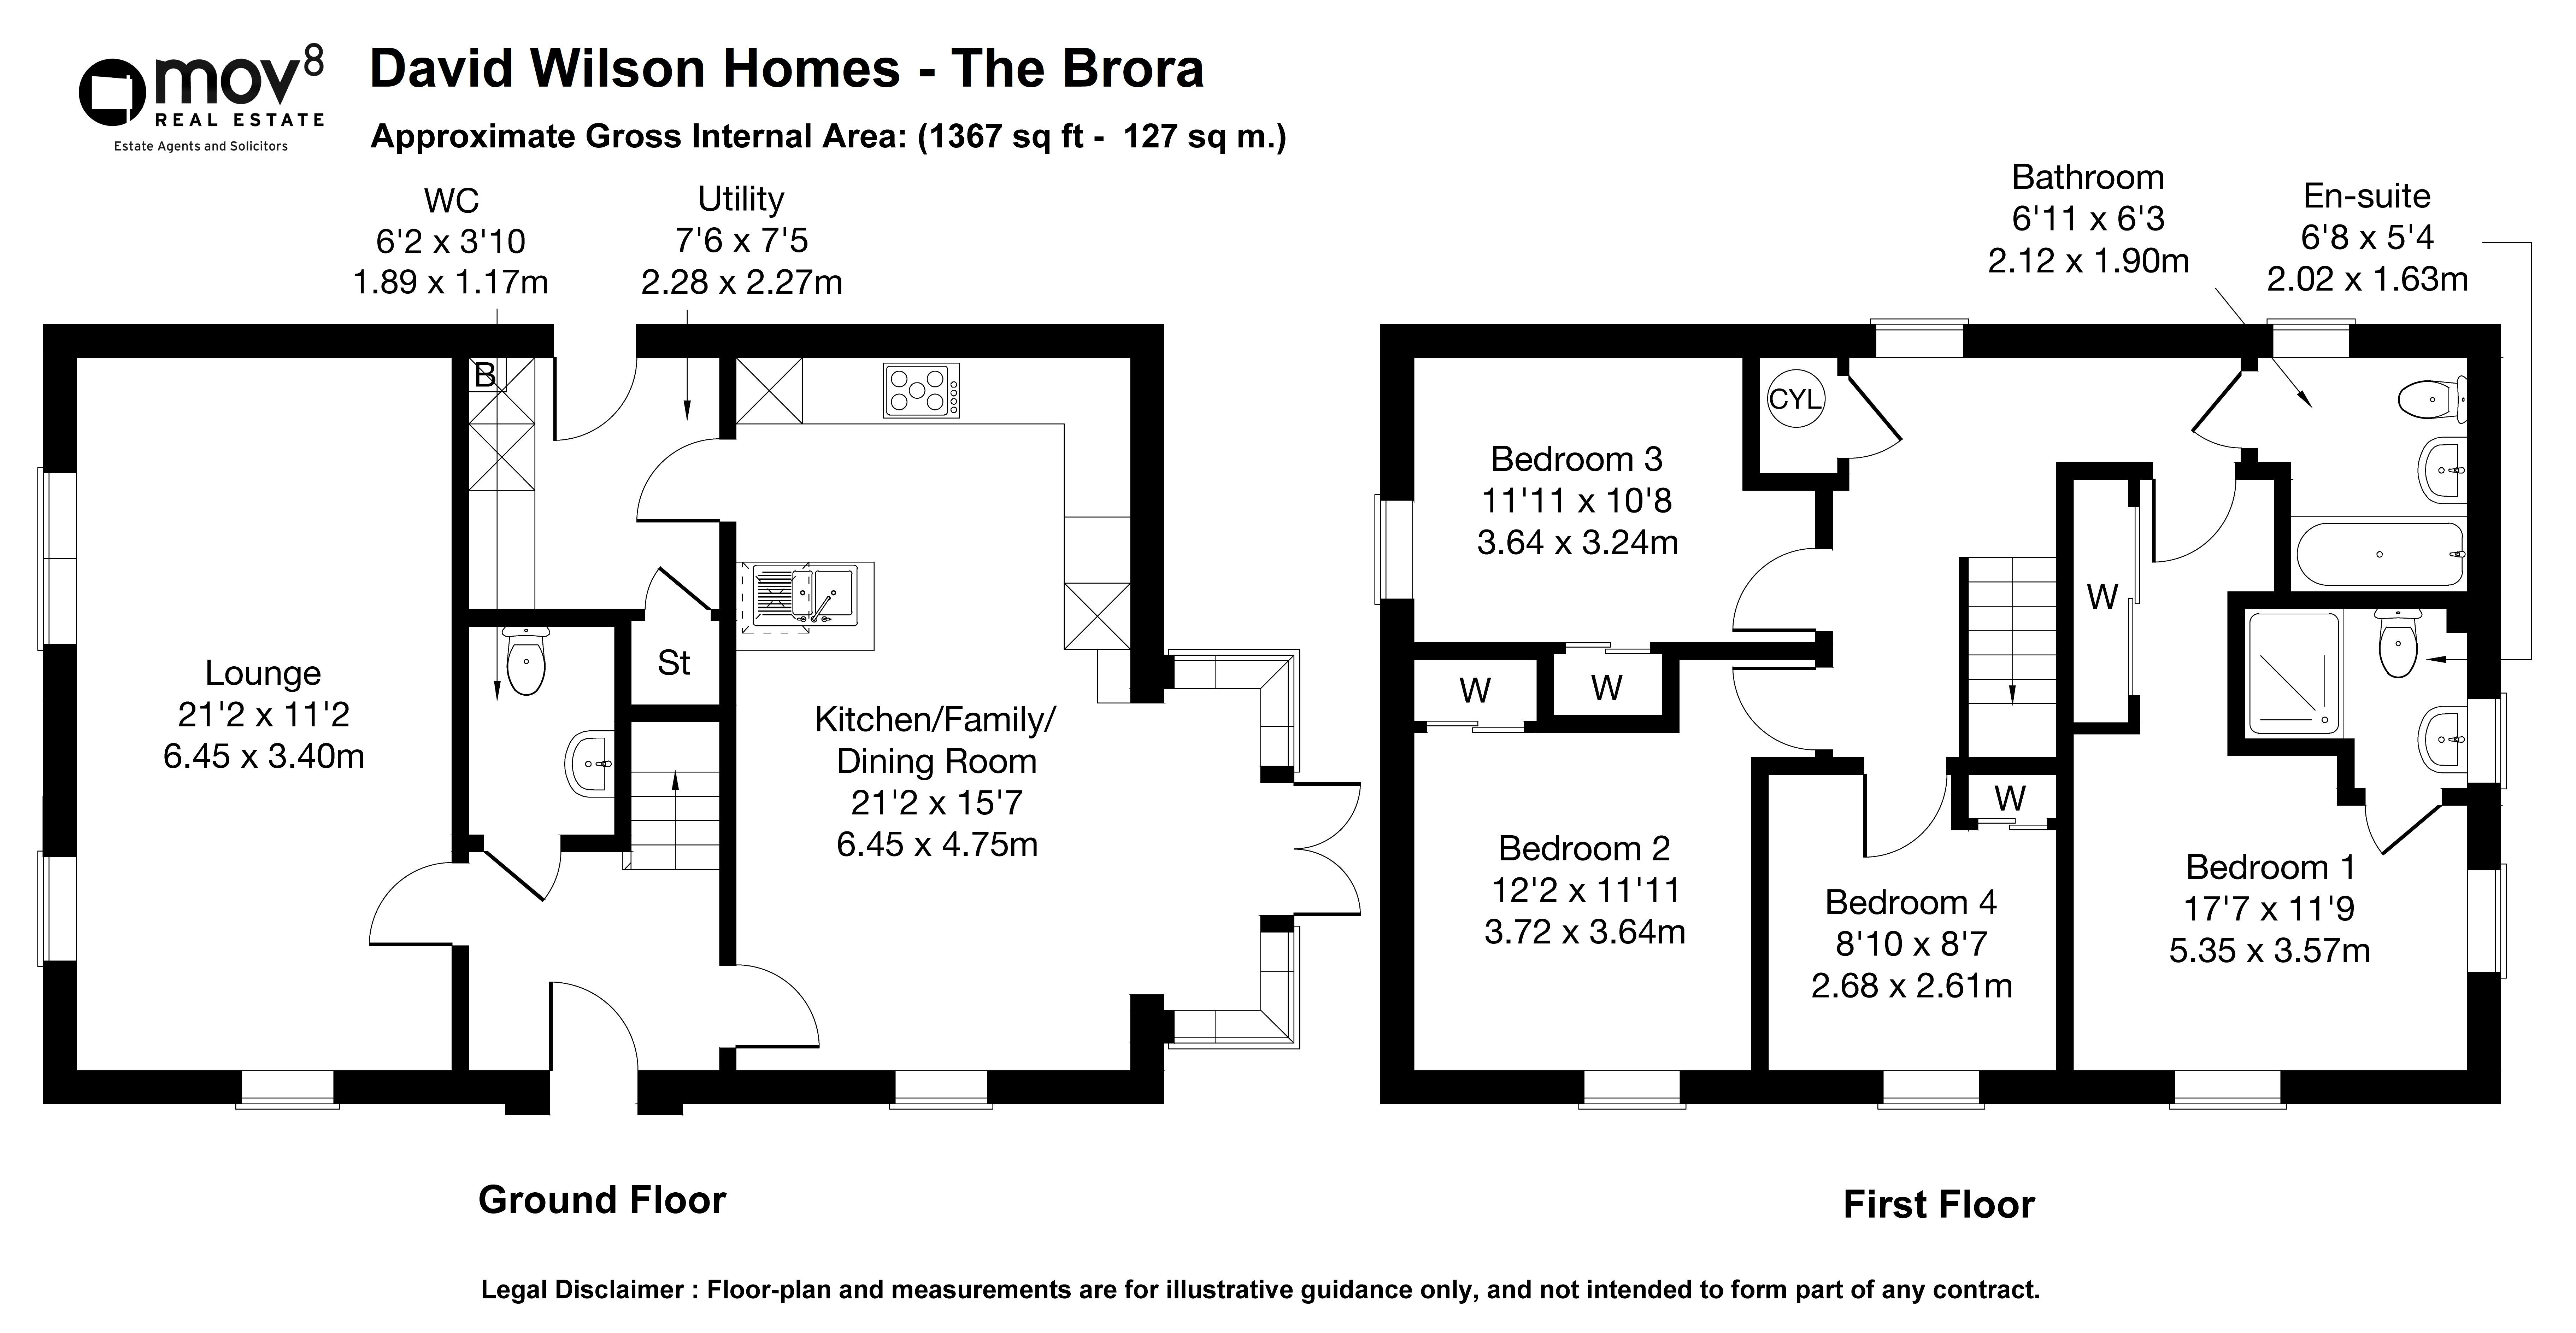 Floorplan 1 of David Wilson Homes The Brora, Glenluce Drive, Bishopton, Renfrewshire, PA7 5FW